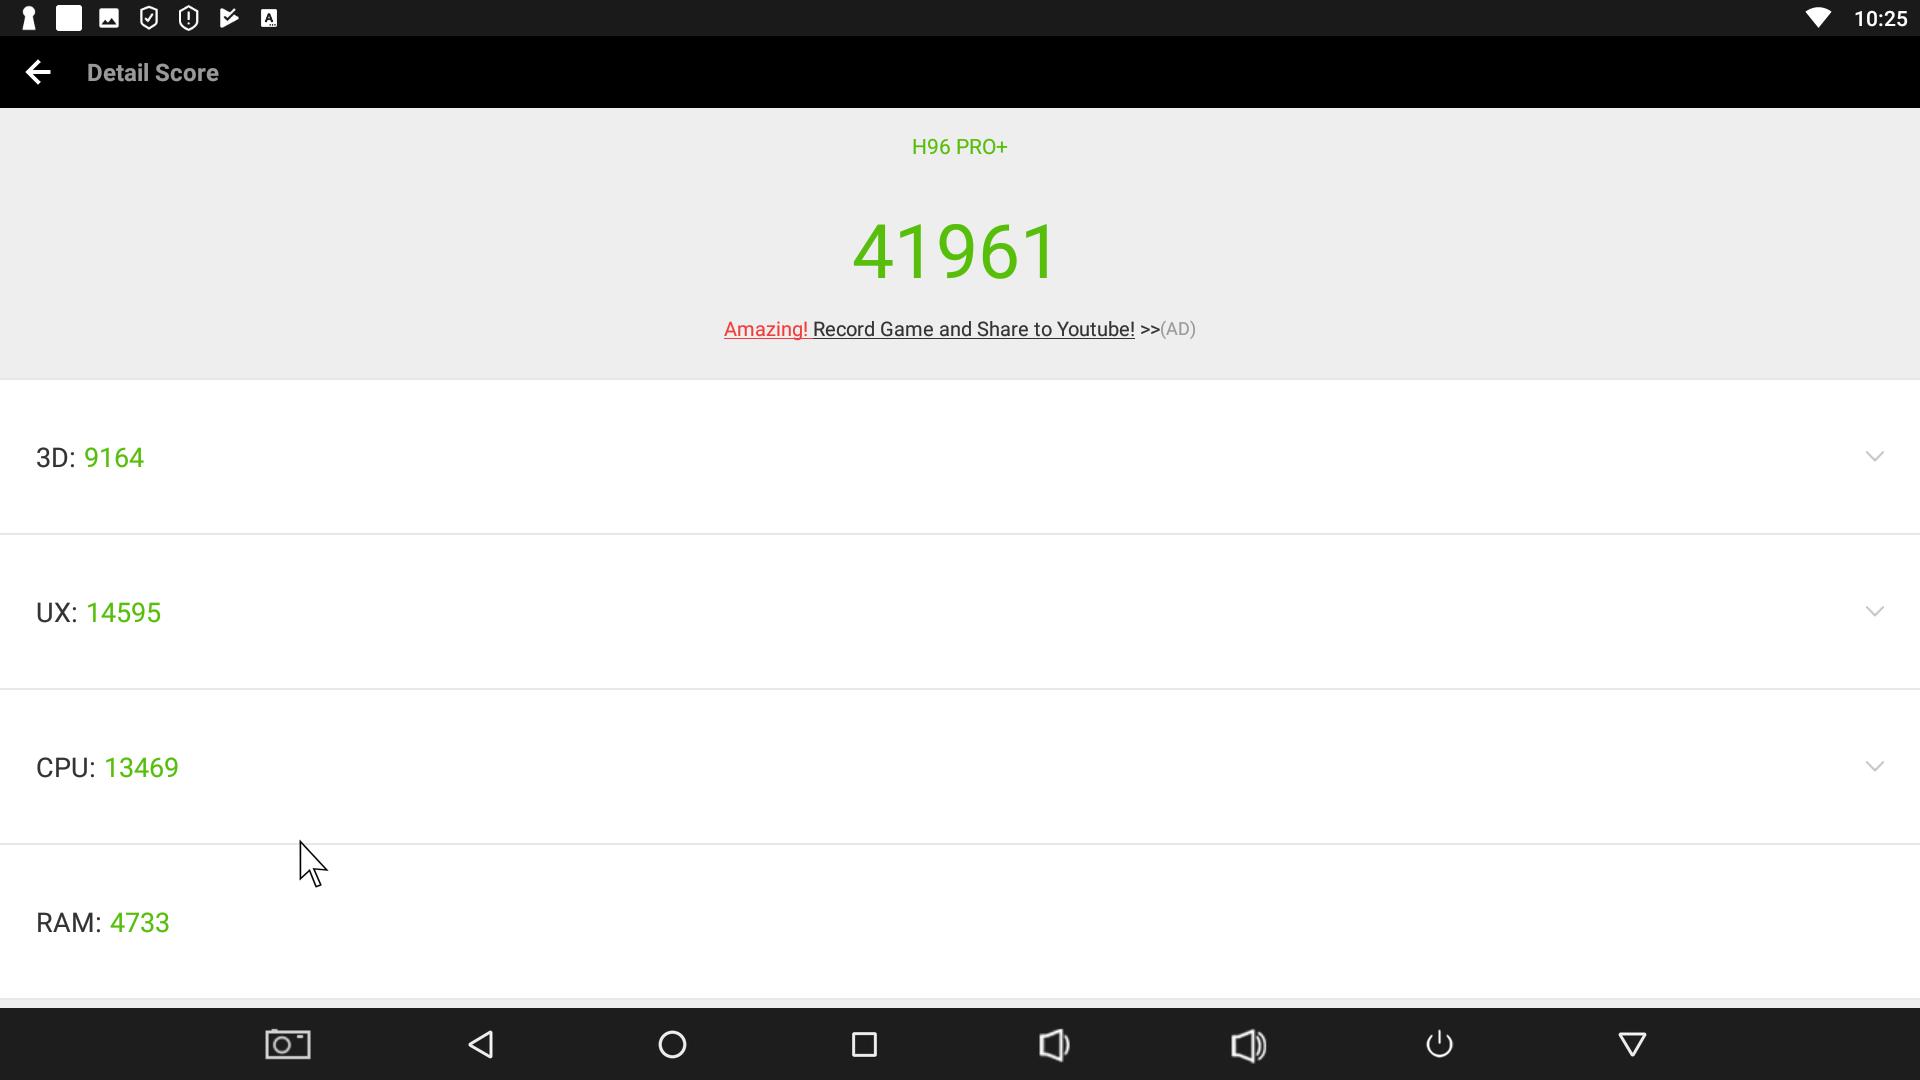 screenshot_20170803-102535.png